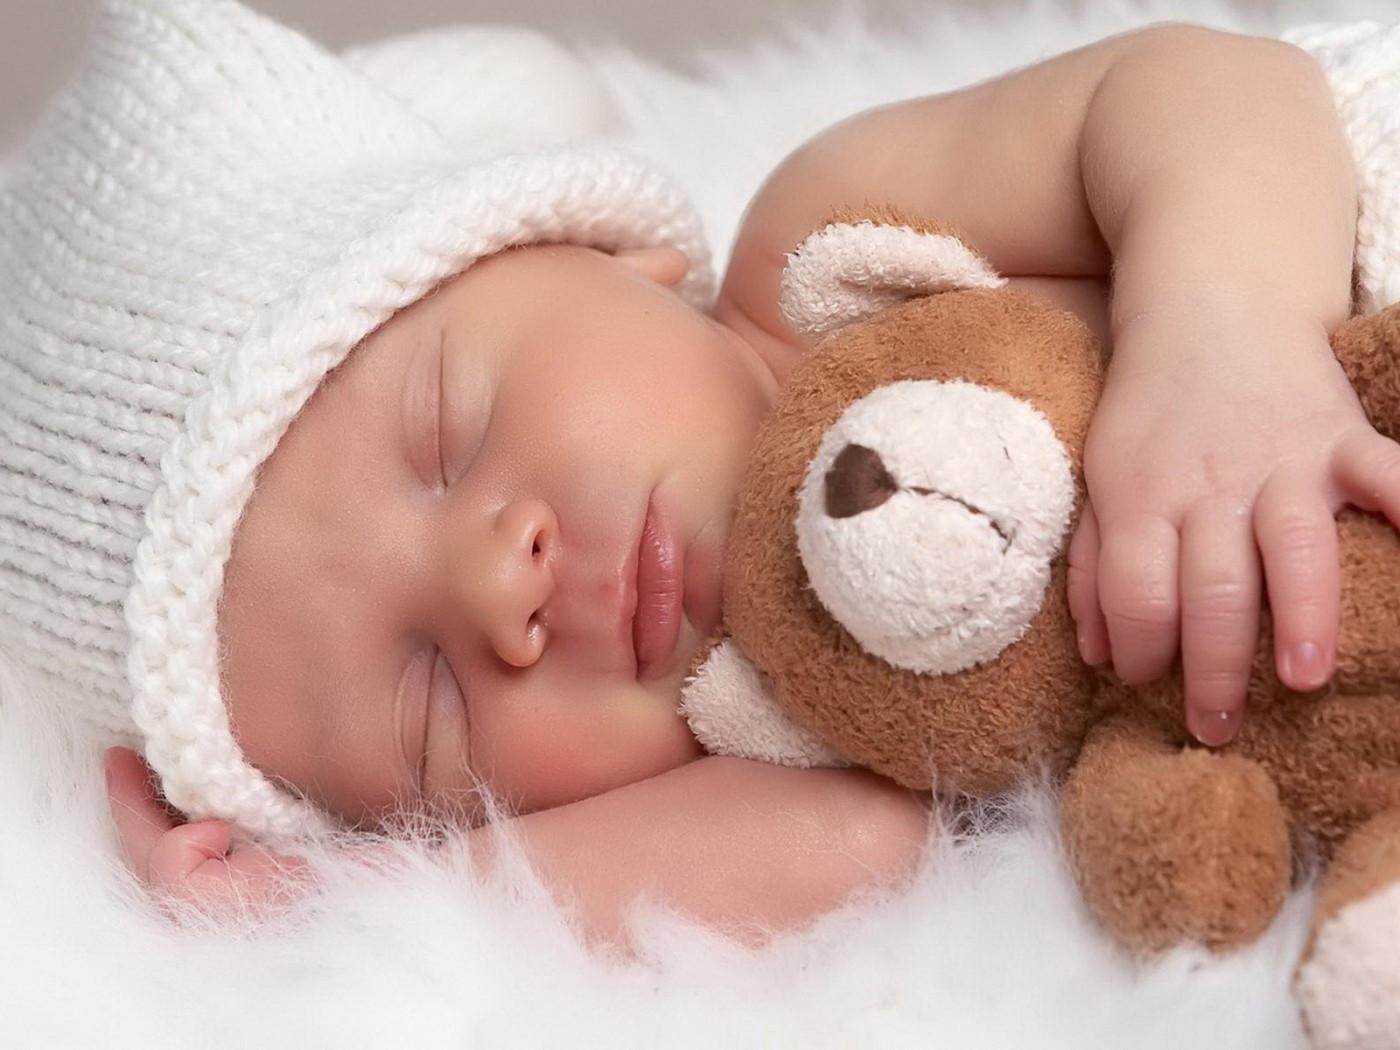 People_Children_Sleeping_baby_029016_-1